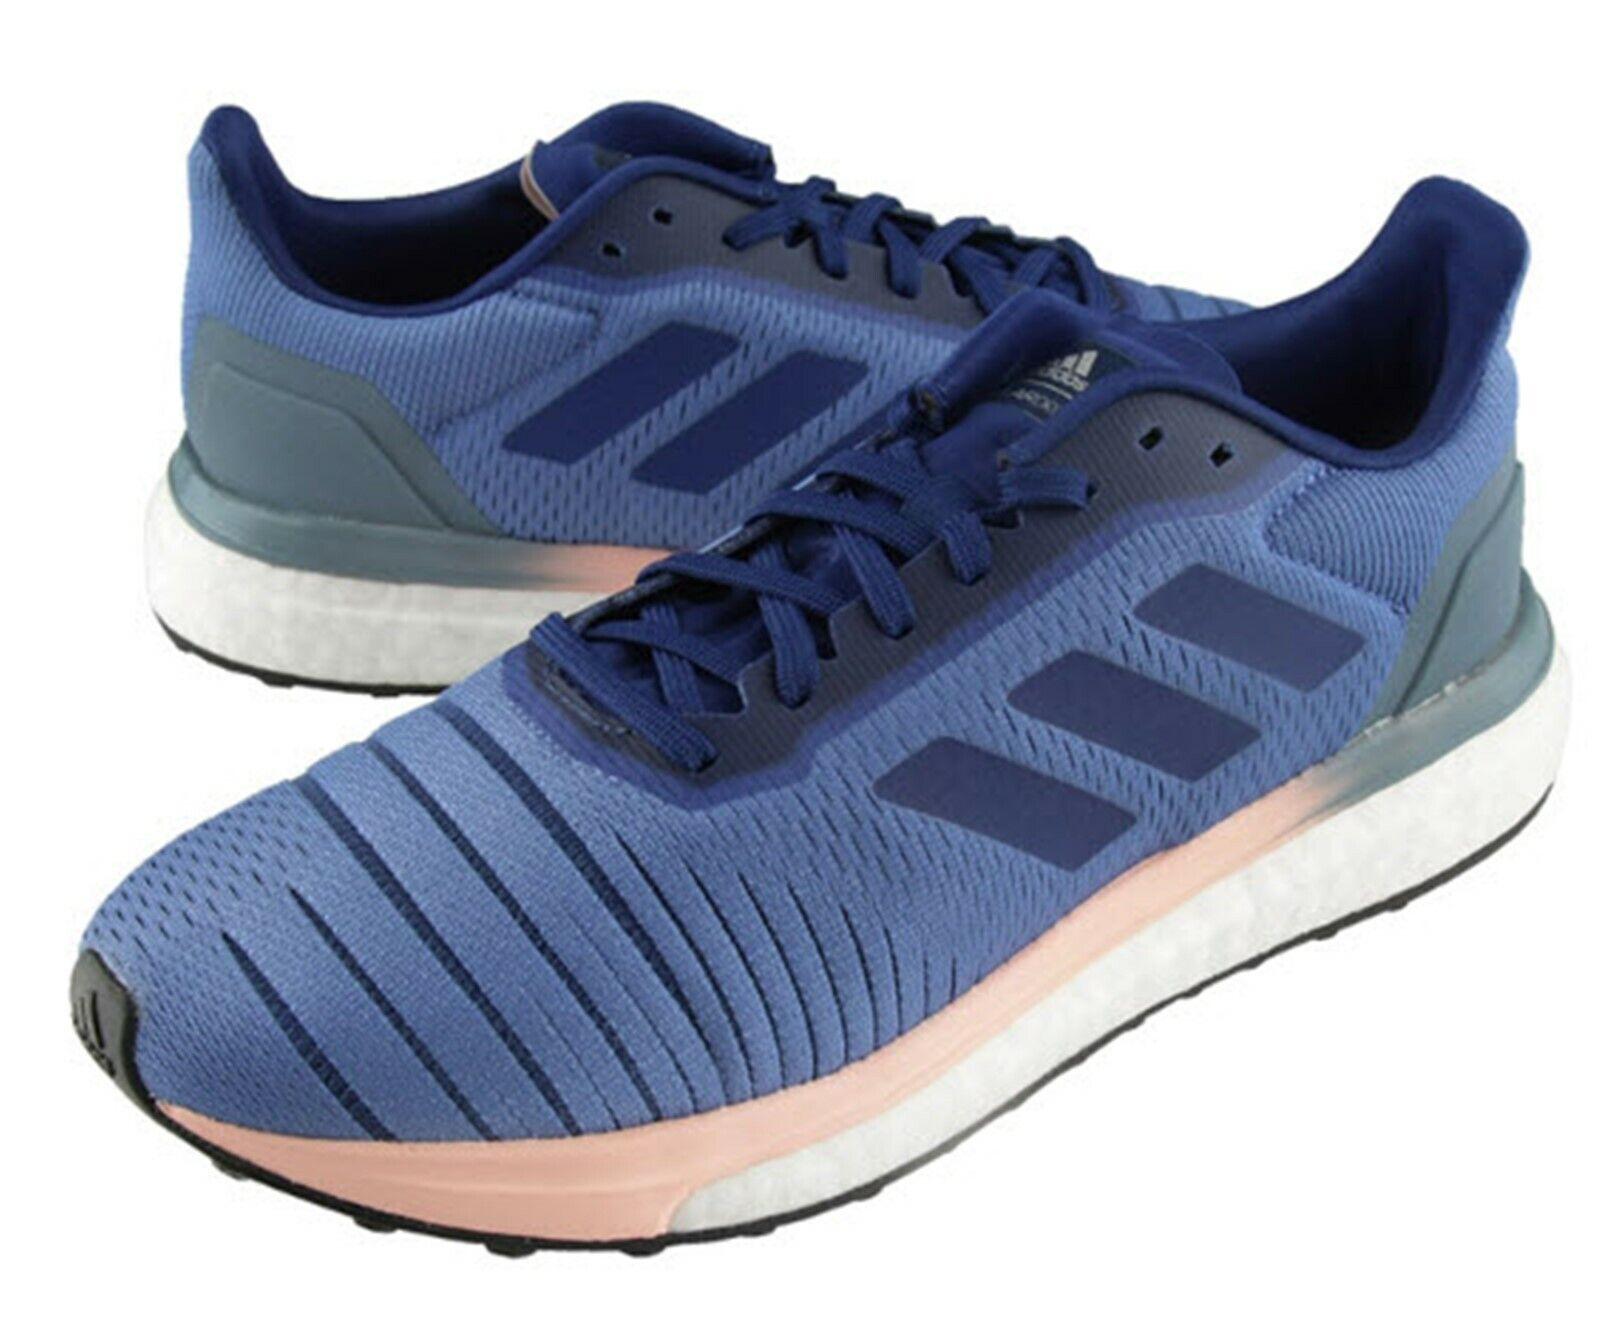 Adidas Vrouwen Solar Drive Training schoenen blauw hardlopen sportschoenen GYM schoen AC8399